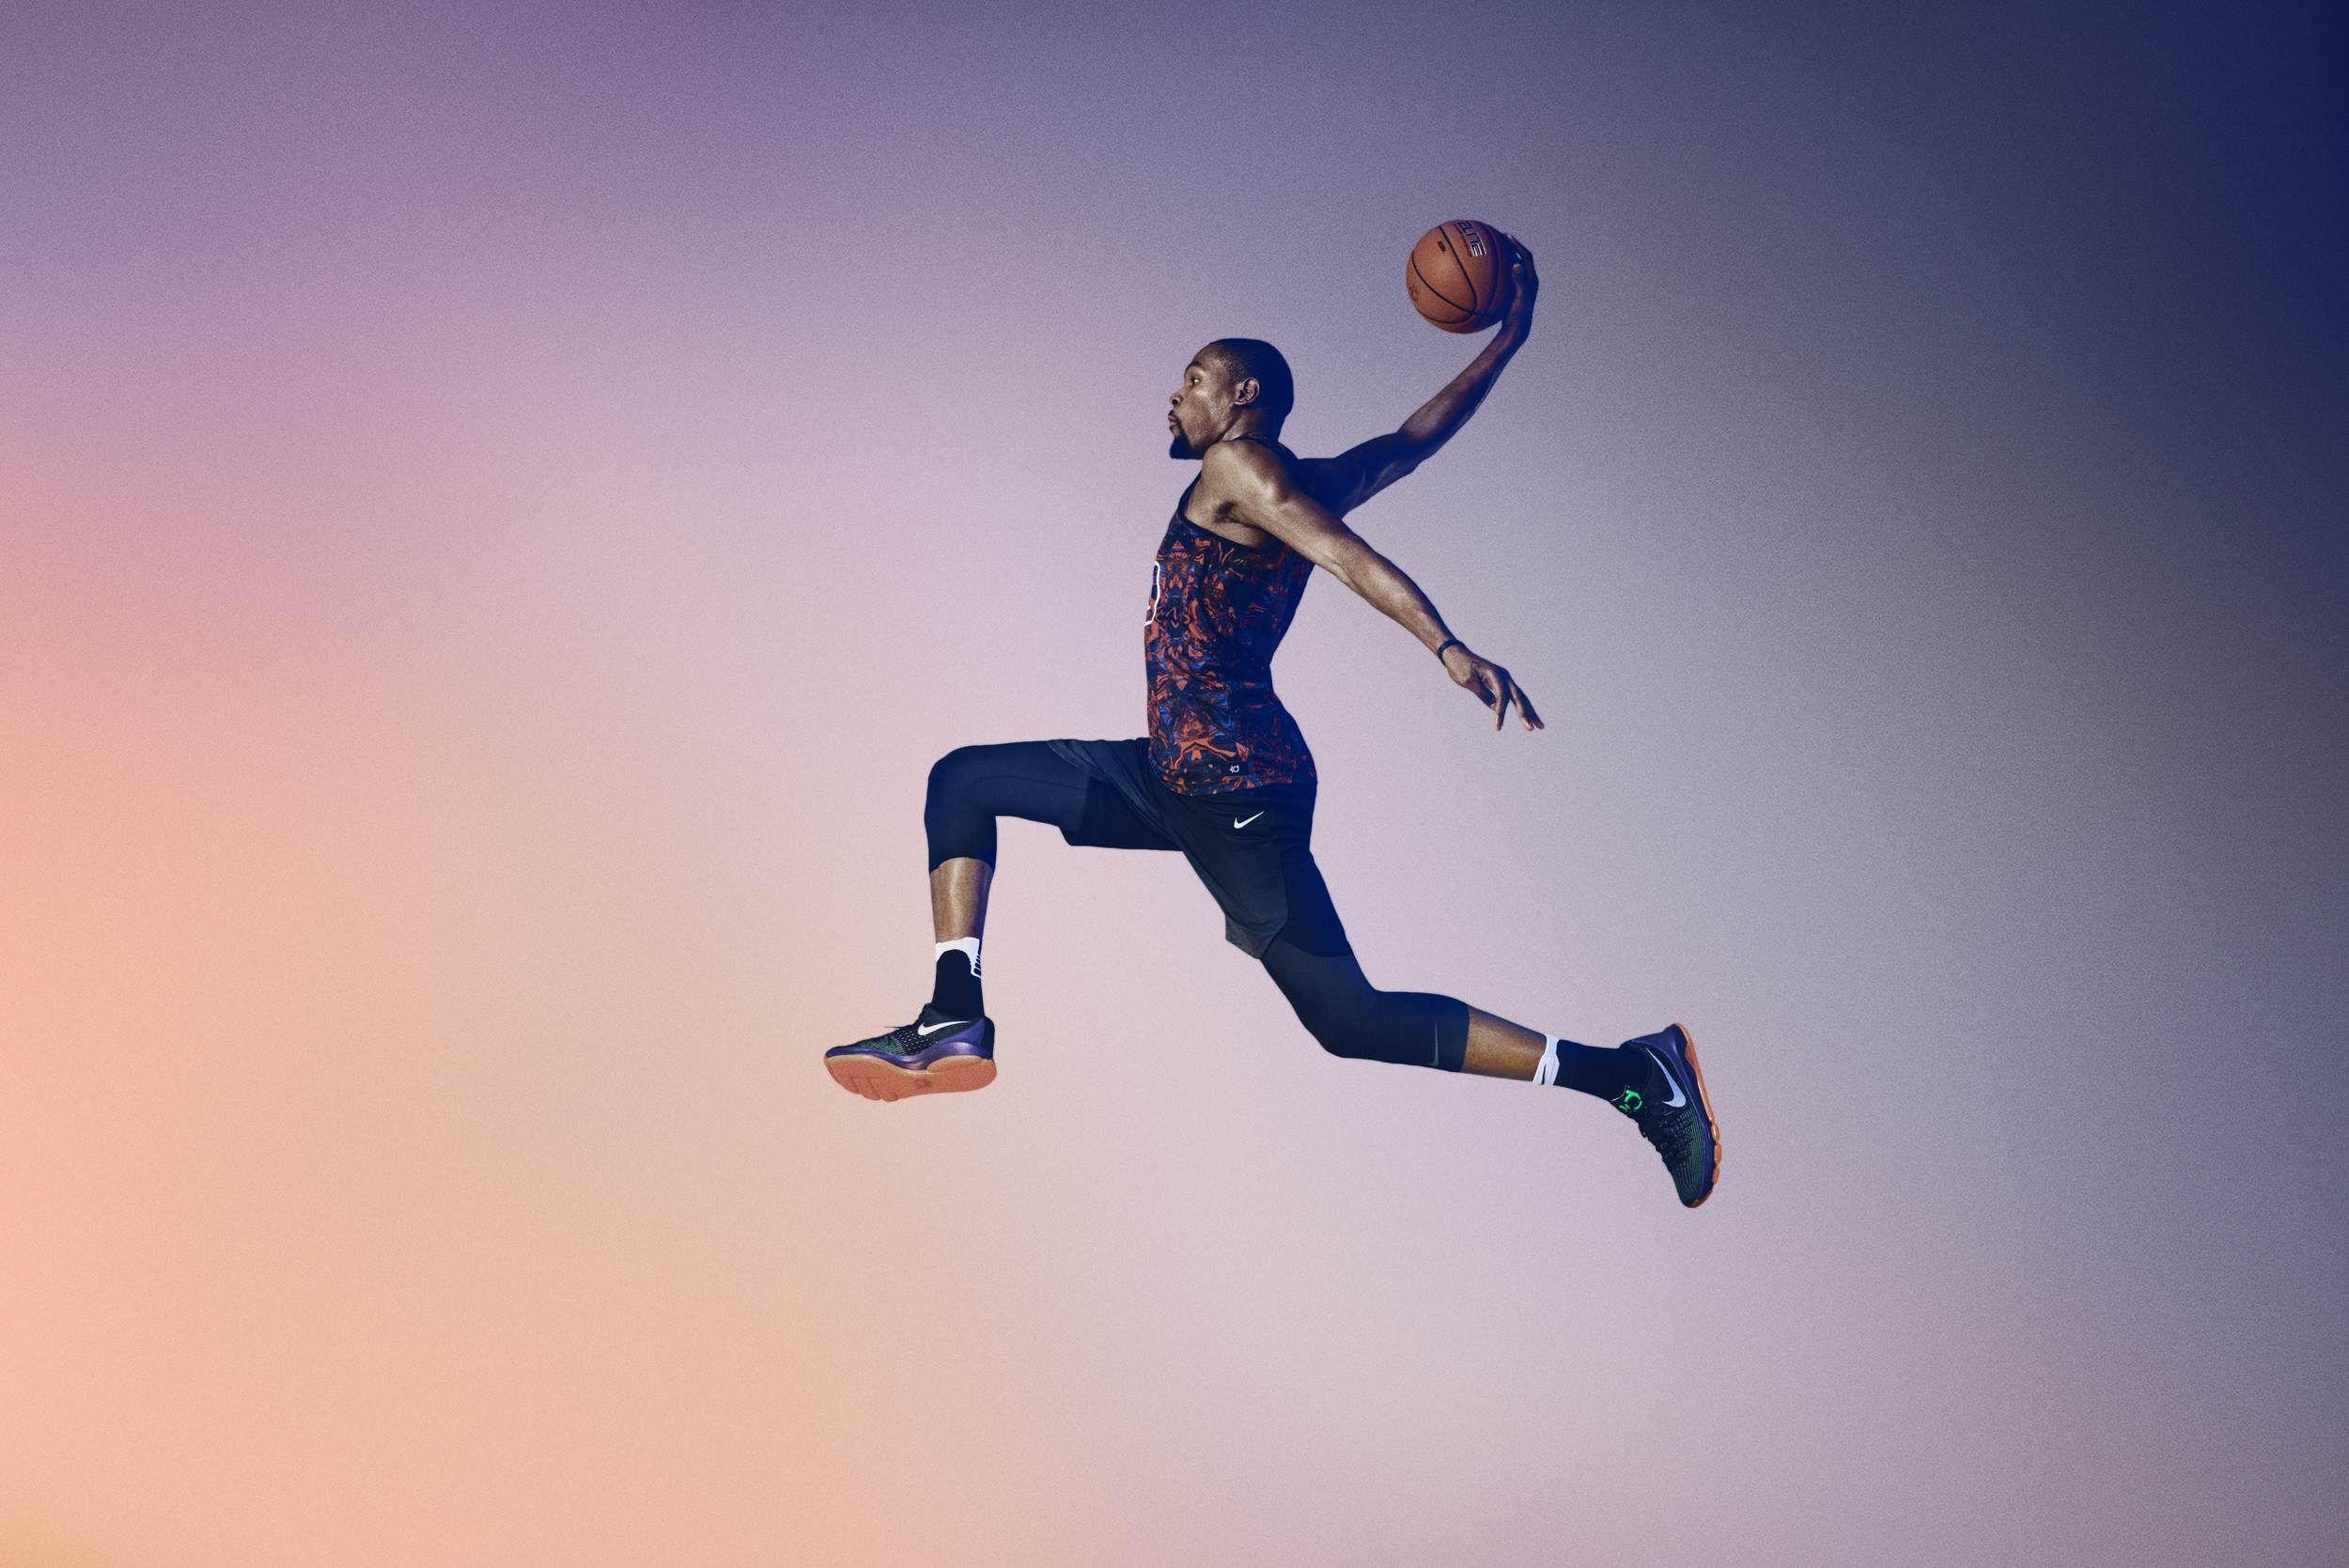 Sports Wallpapers Hd On Wallpaper 1080p Hd Lionel Messi Sports Wallpapers Sports Design